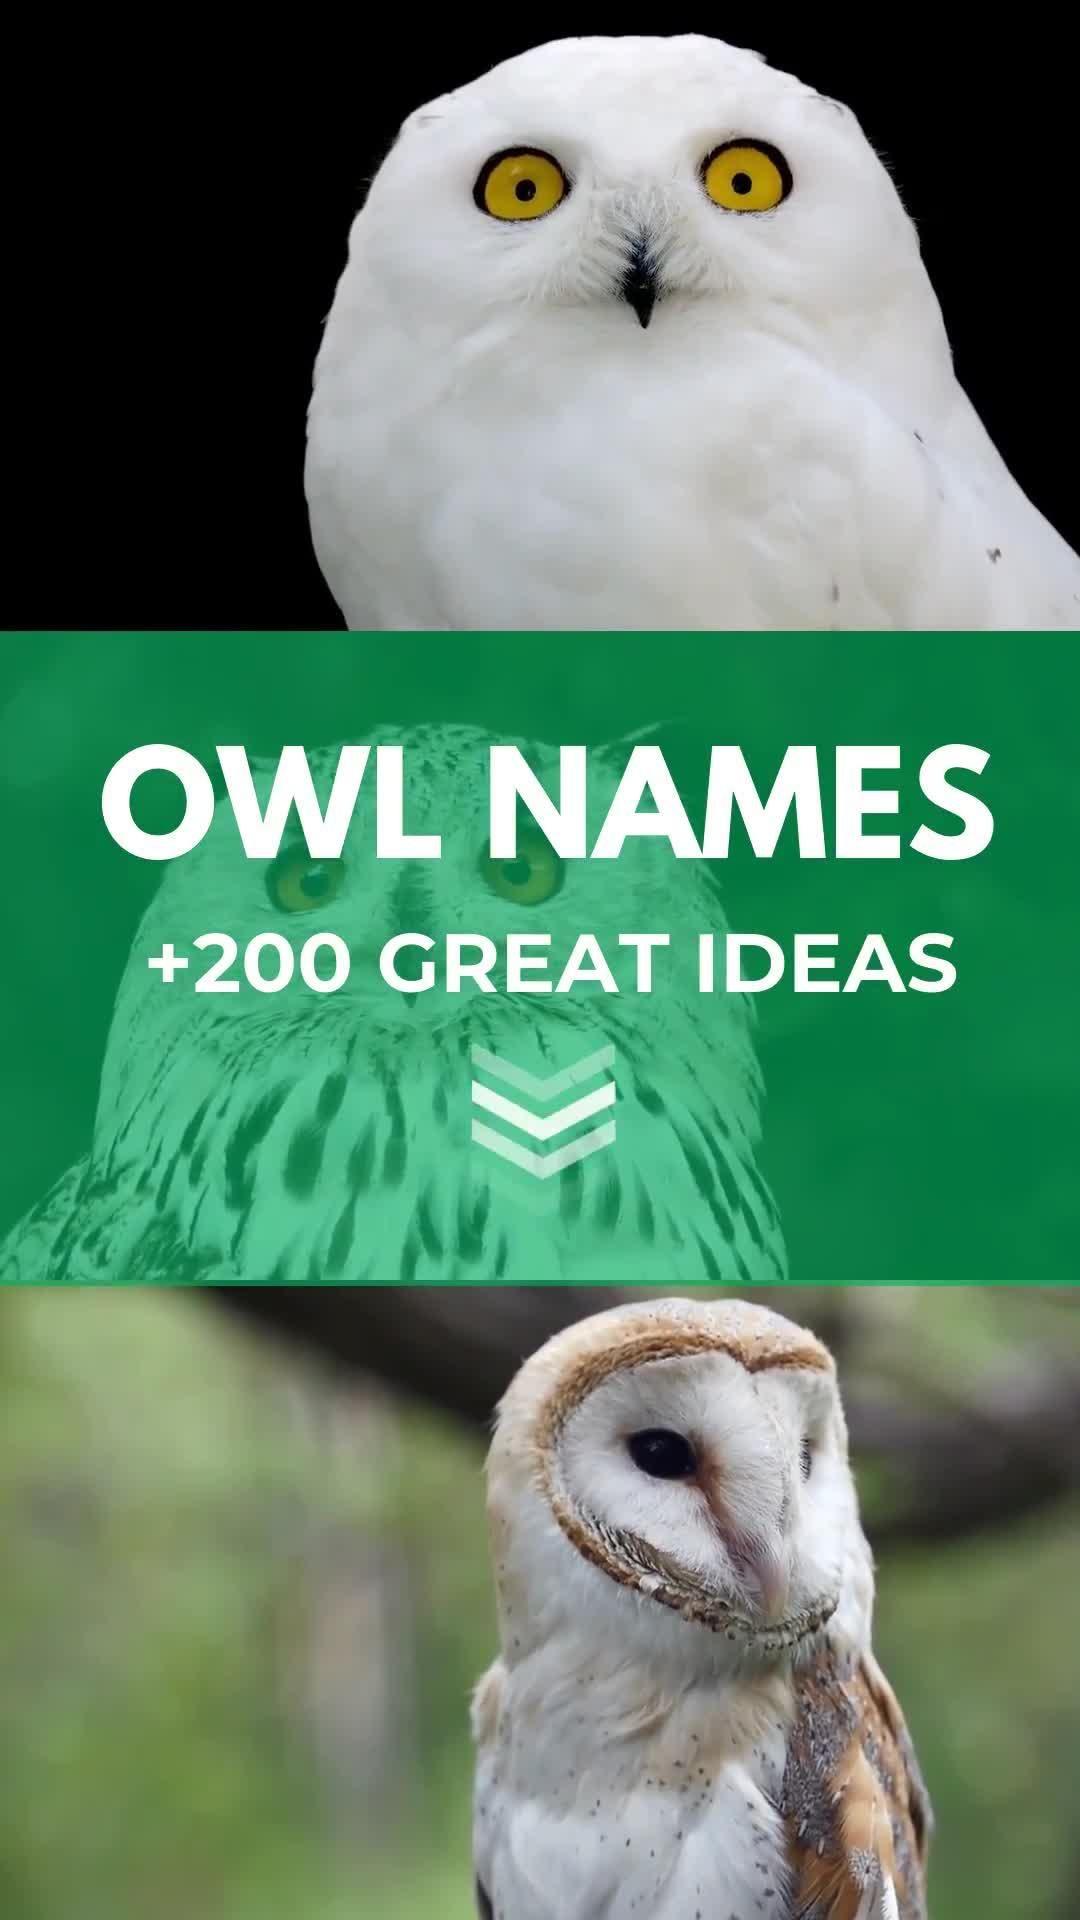 Owl Names 200 Incredible Ideas Incl Harry Potter Owl Petshoper Video Video Cute Little Animals Cute Names Pet Names